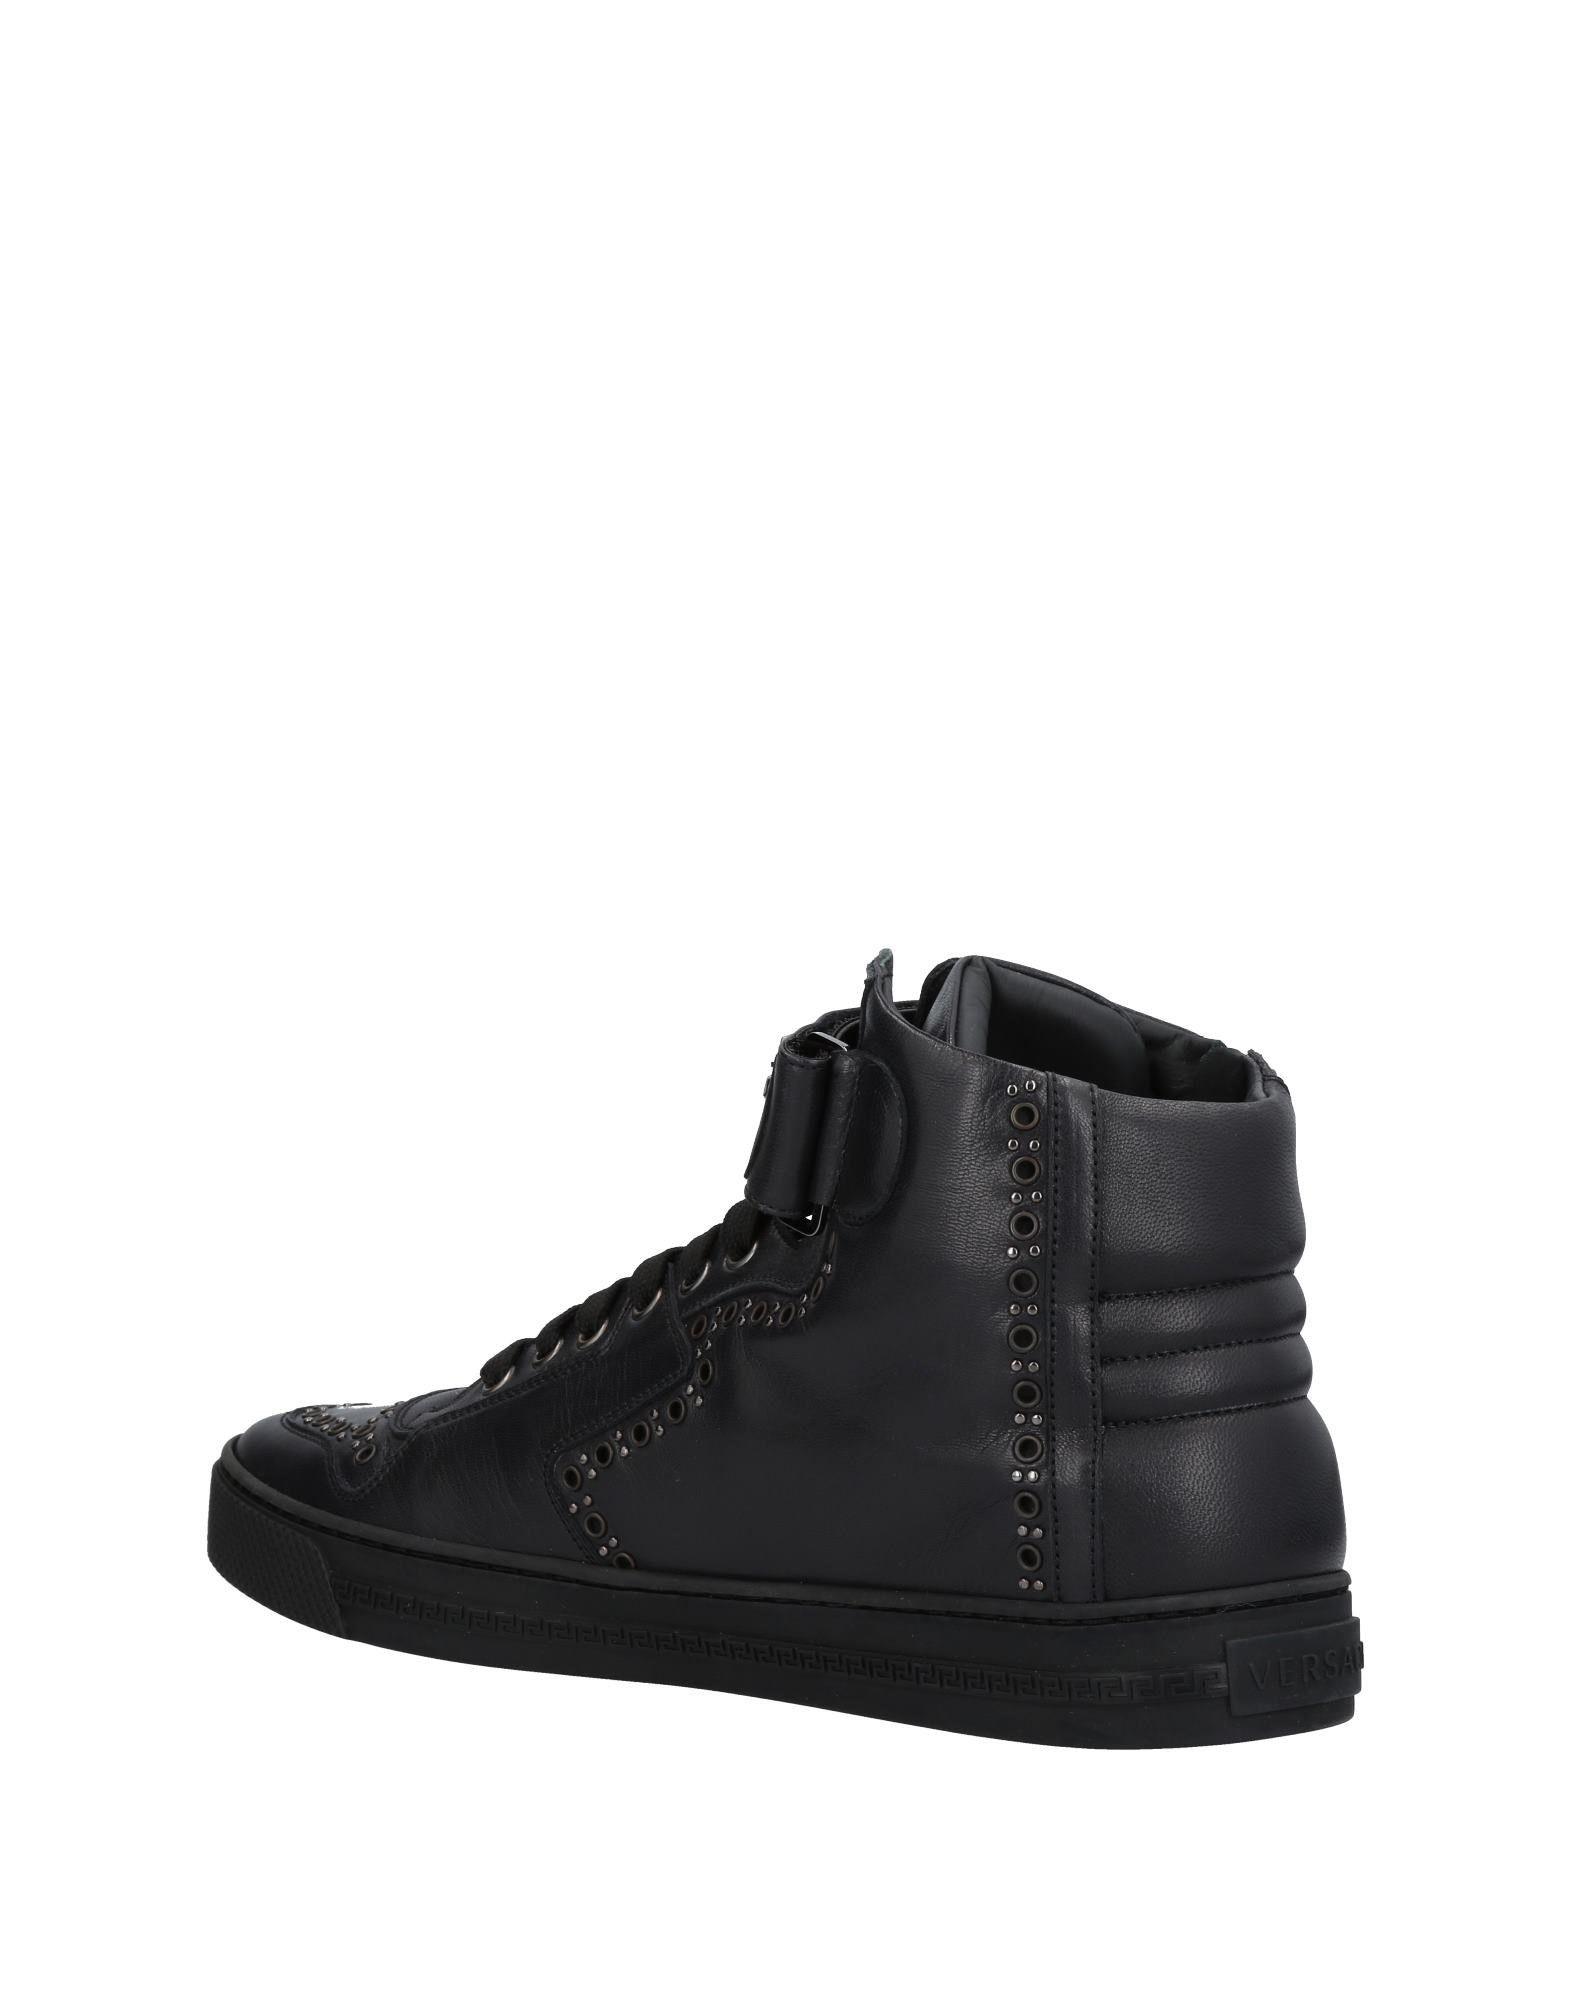 Versace Sneakers Herren   11461147RG Heiße Schuhe 7476ed